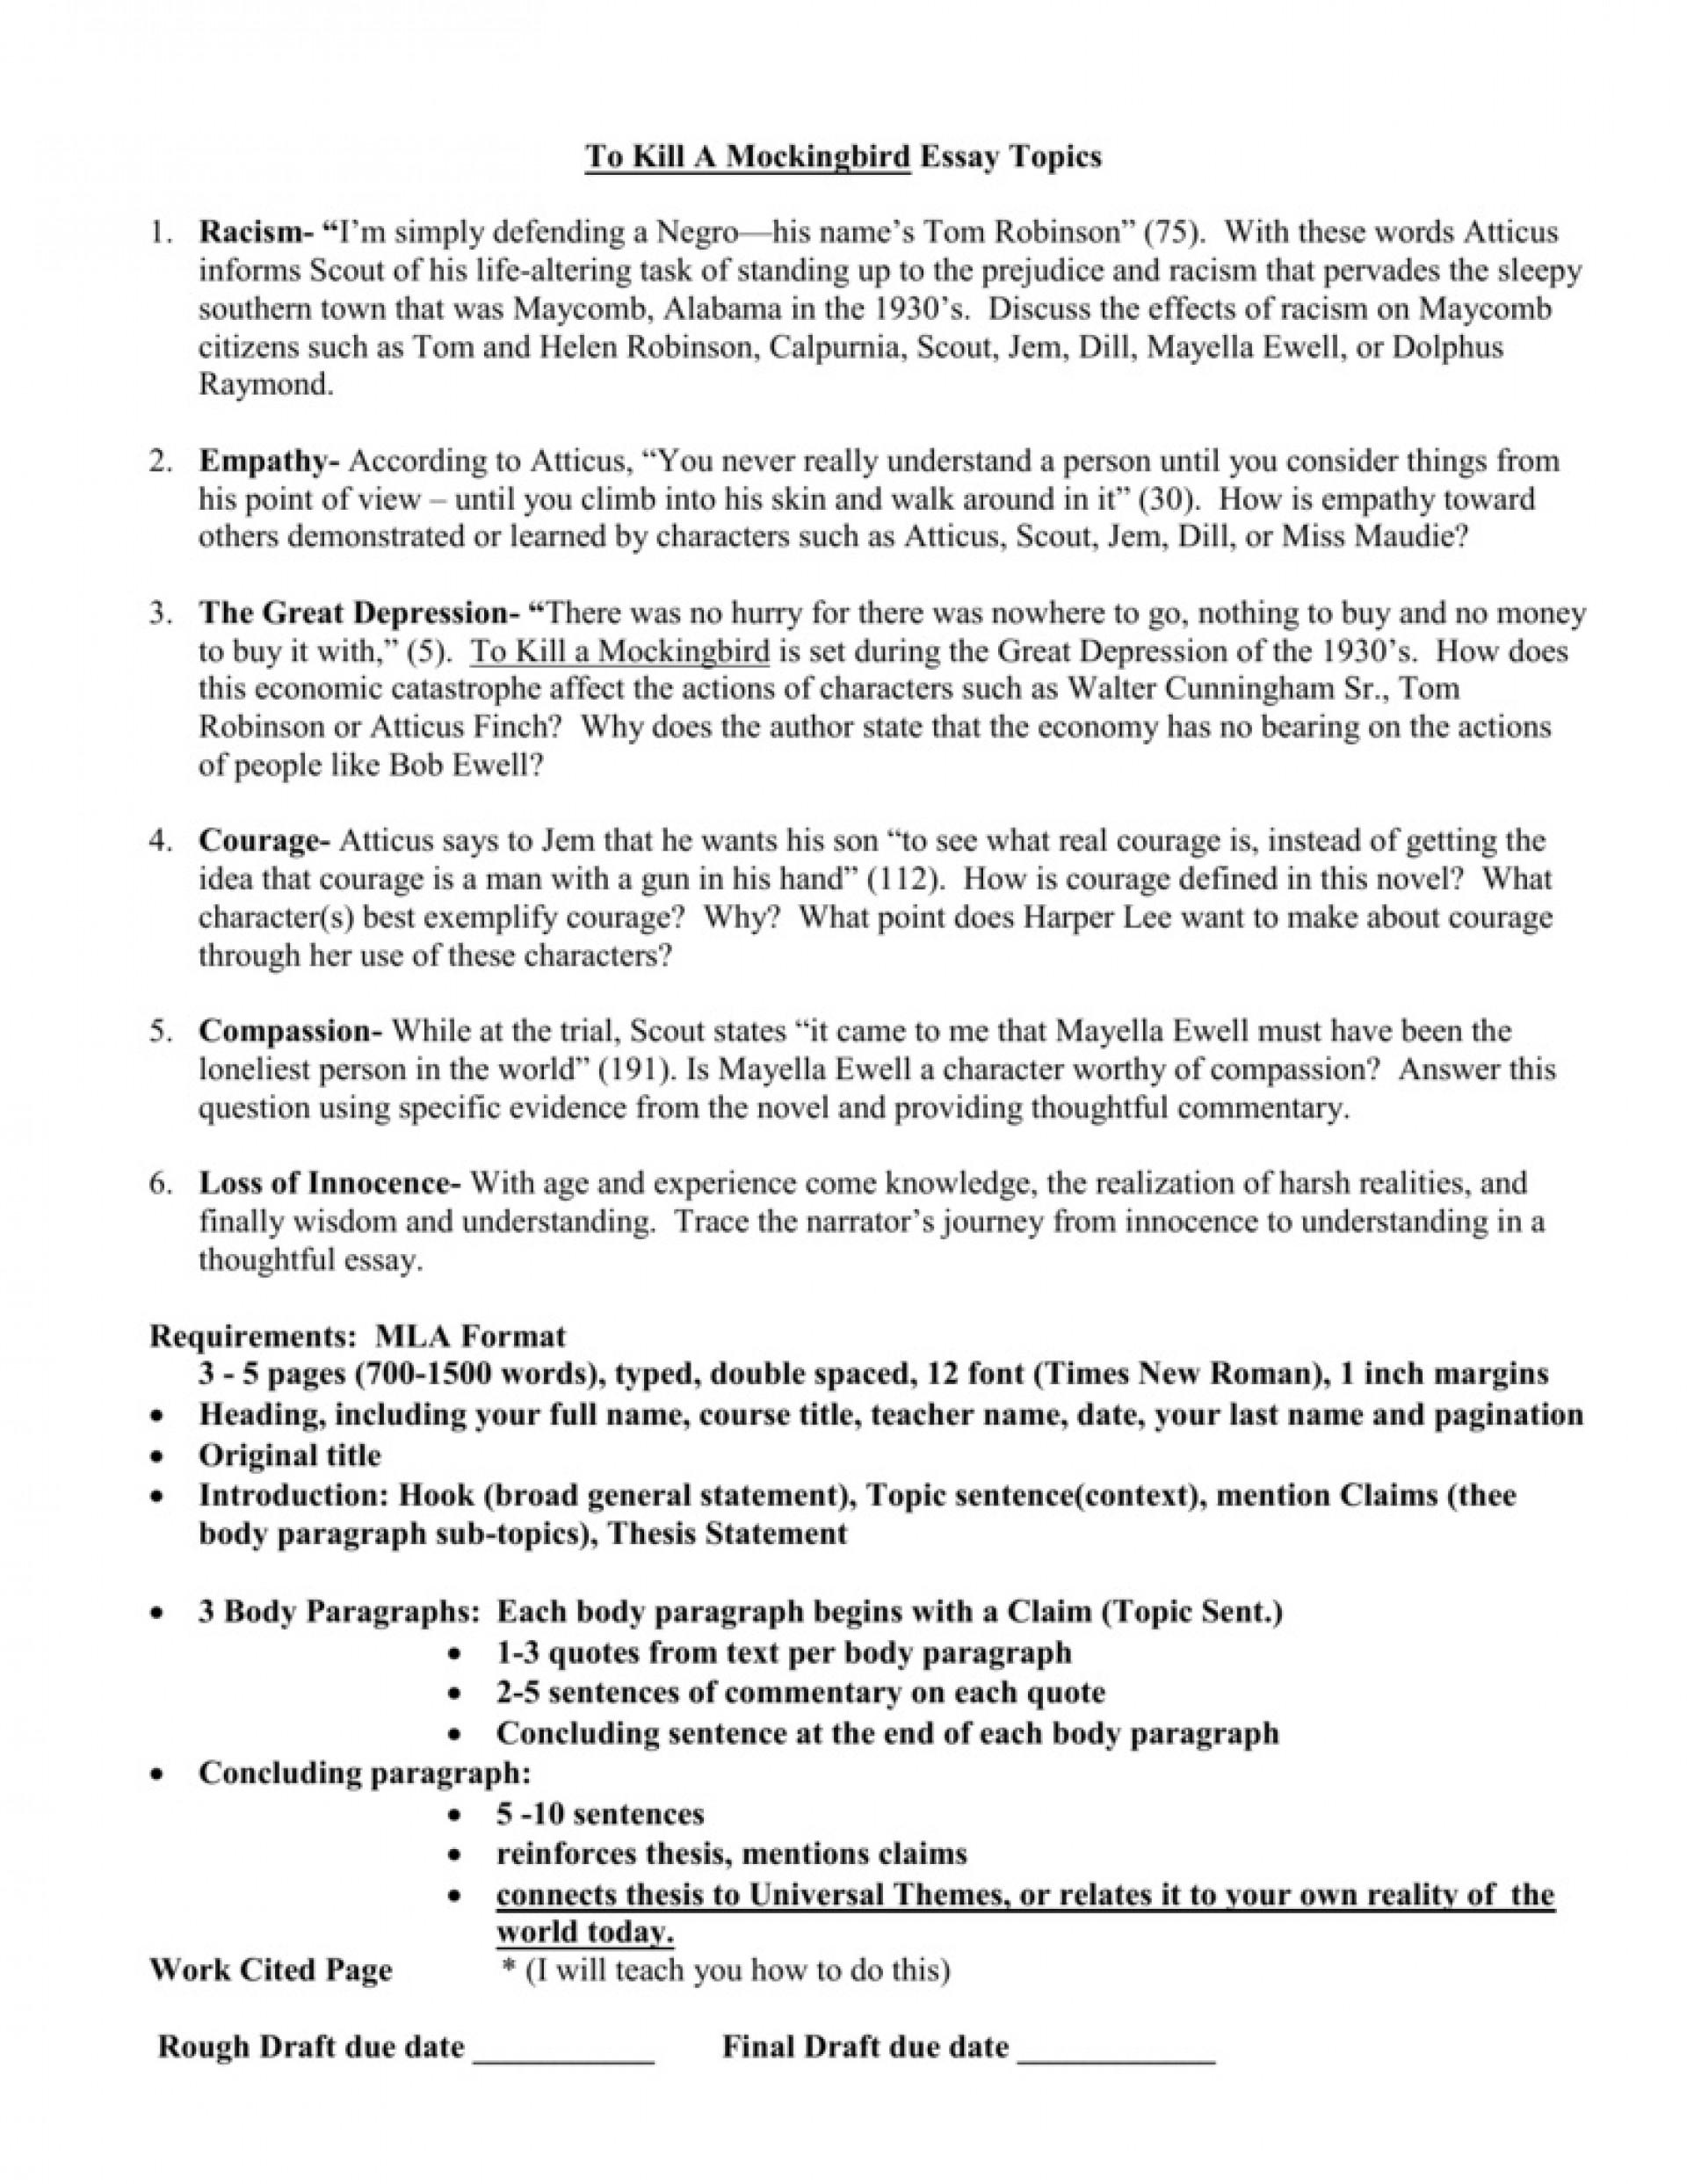 003 Imposing To Kill A Mockingbird Essay Image  Question Courage Thesi Pdf1920